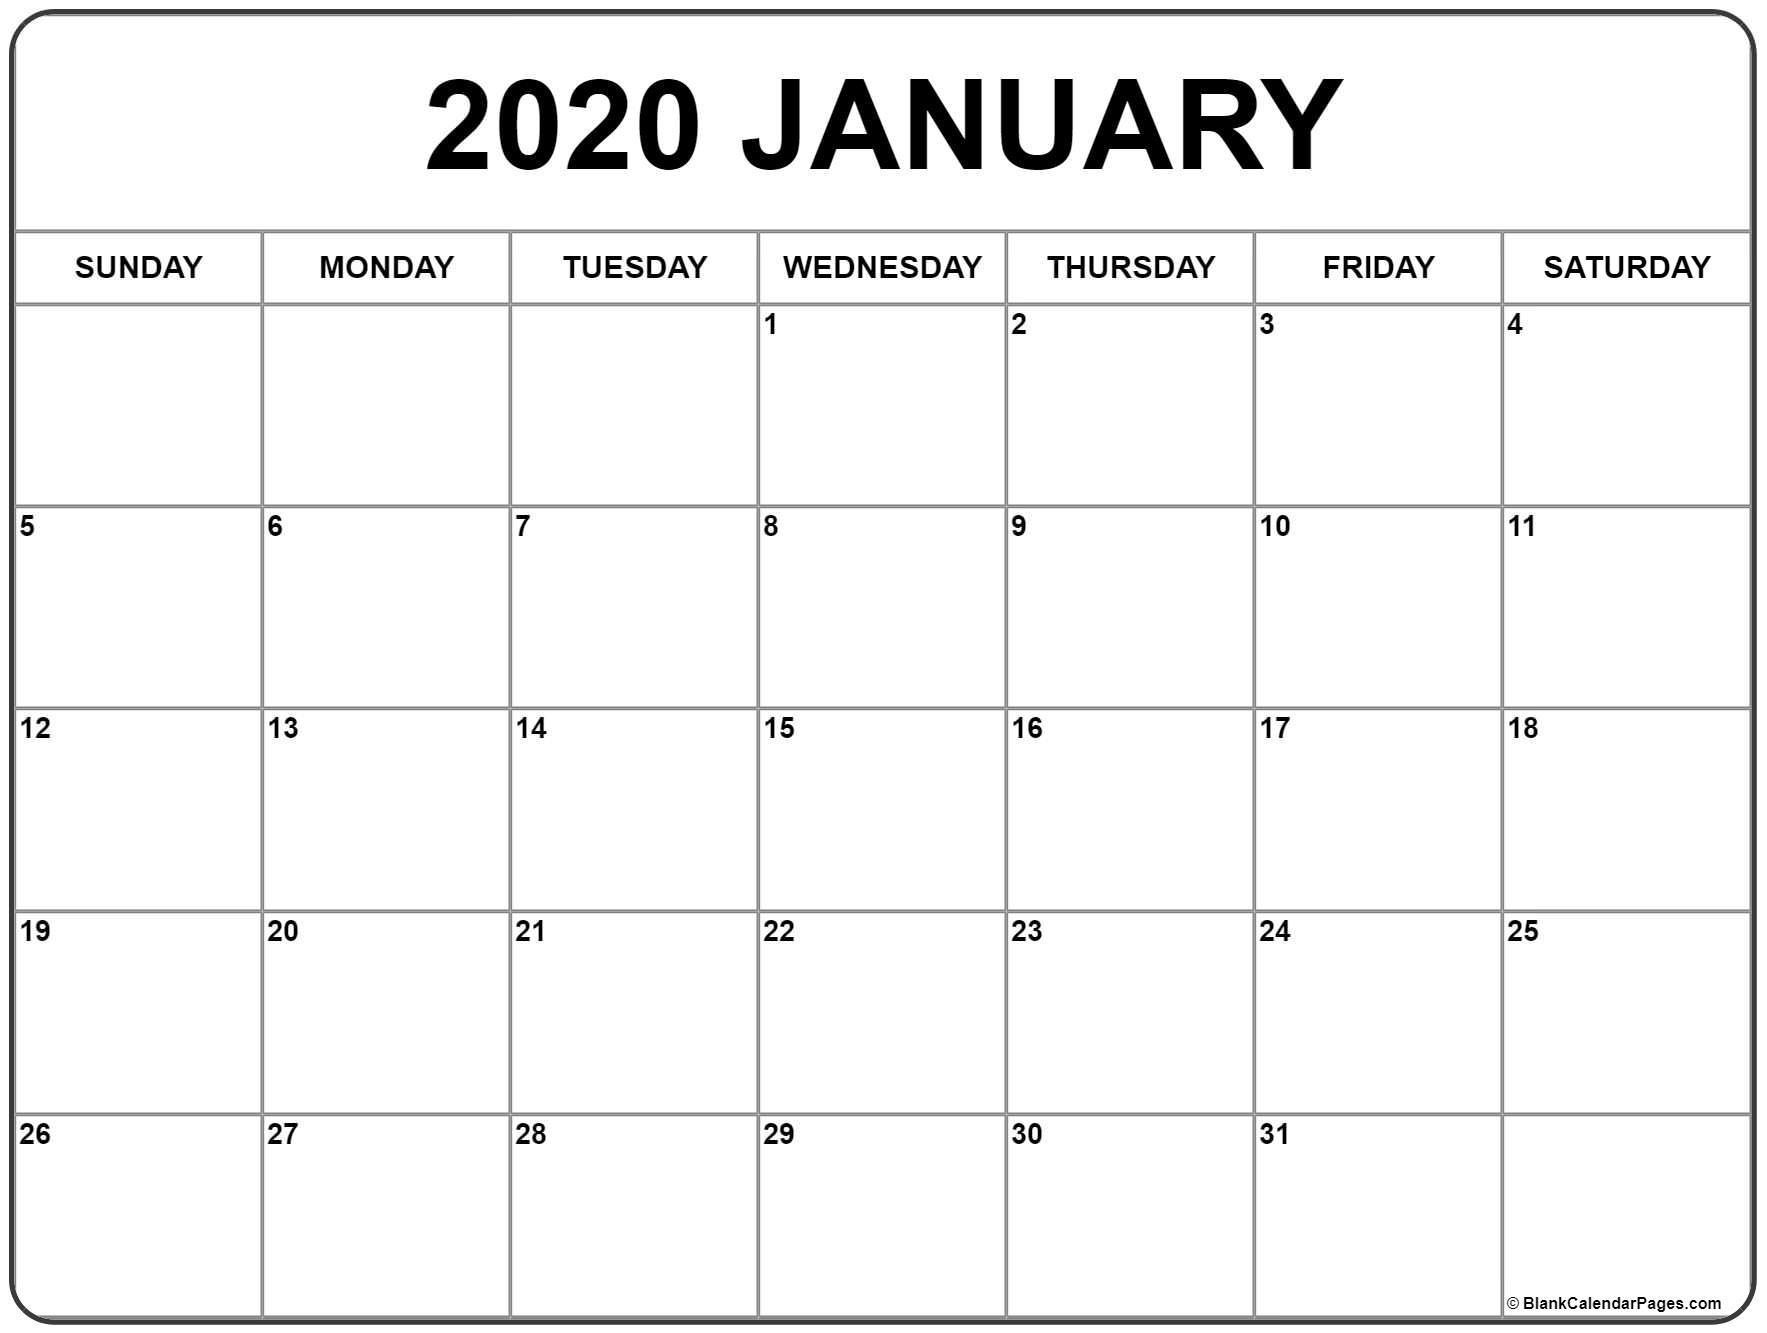 January 2020 Calendar | Free Printable Monthly Calendars-January 2020 Calendar Usa